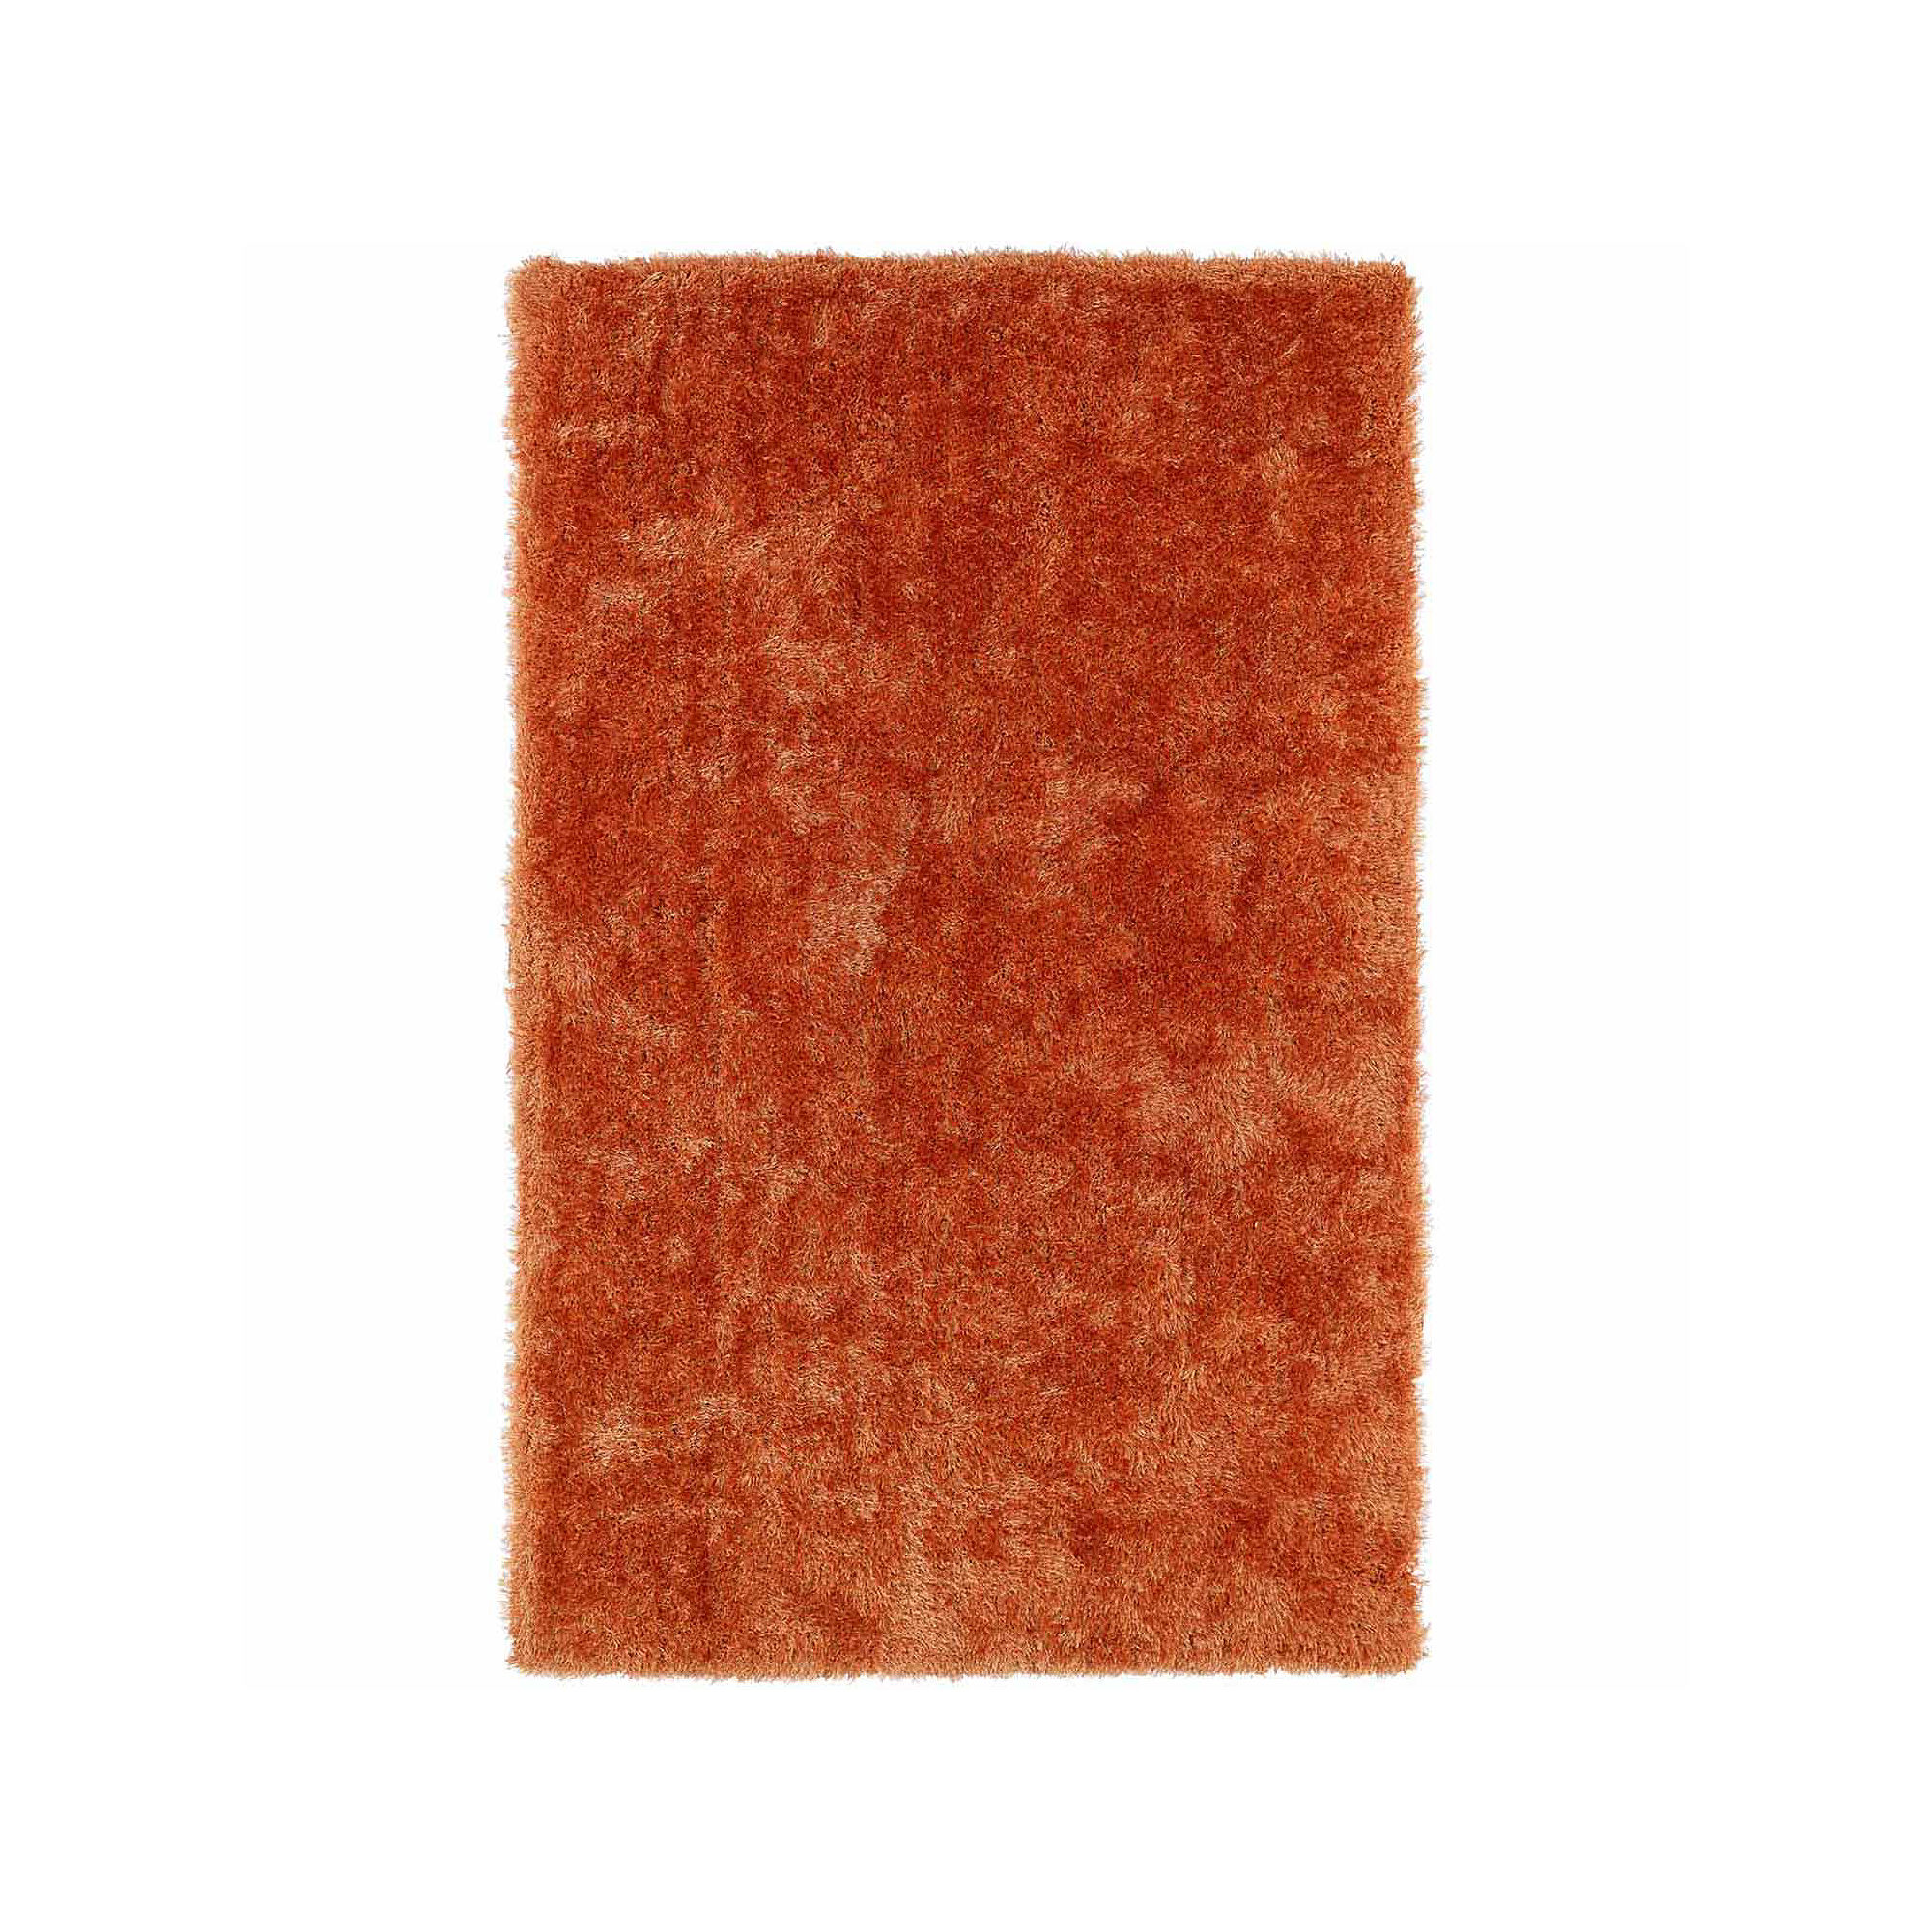 Kaleen Posh Silky Shag Rectangular Rug